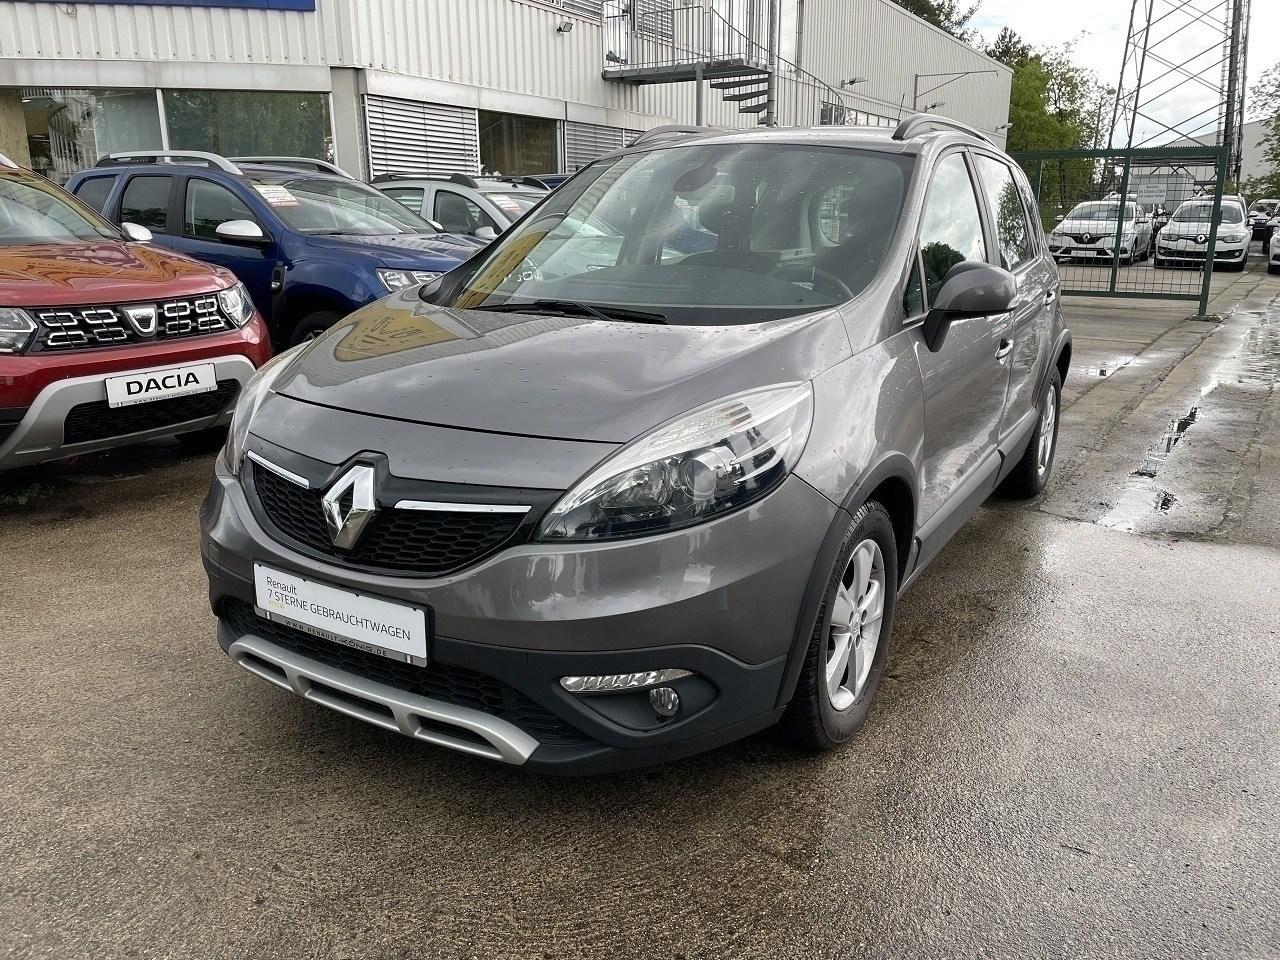 Renault Scenic 1.5 dCi 110 Xmod Paris DeLuxe Navigation, Jahr 2013, Diesel